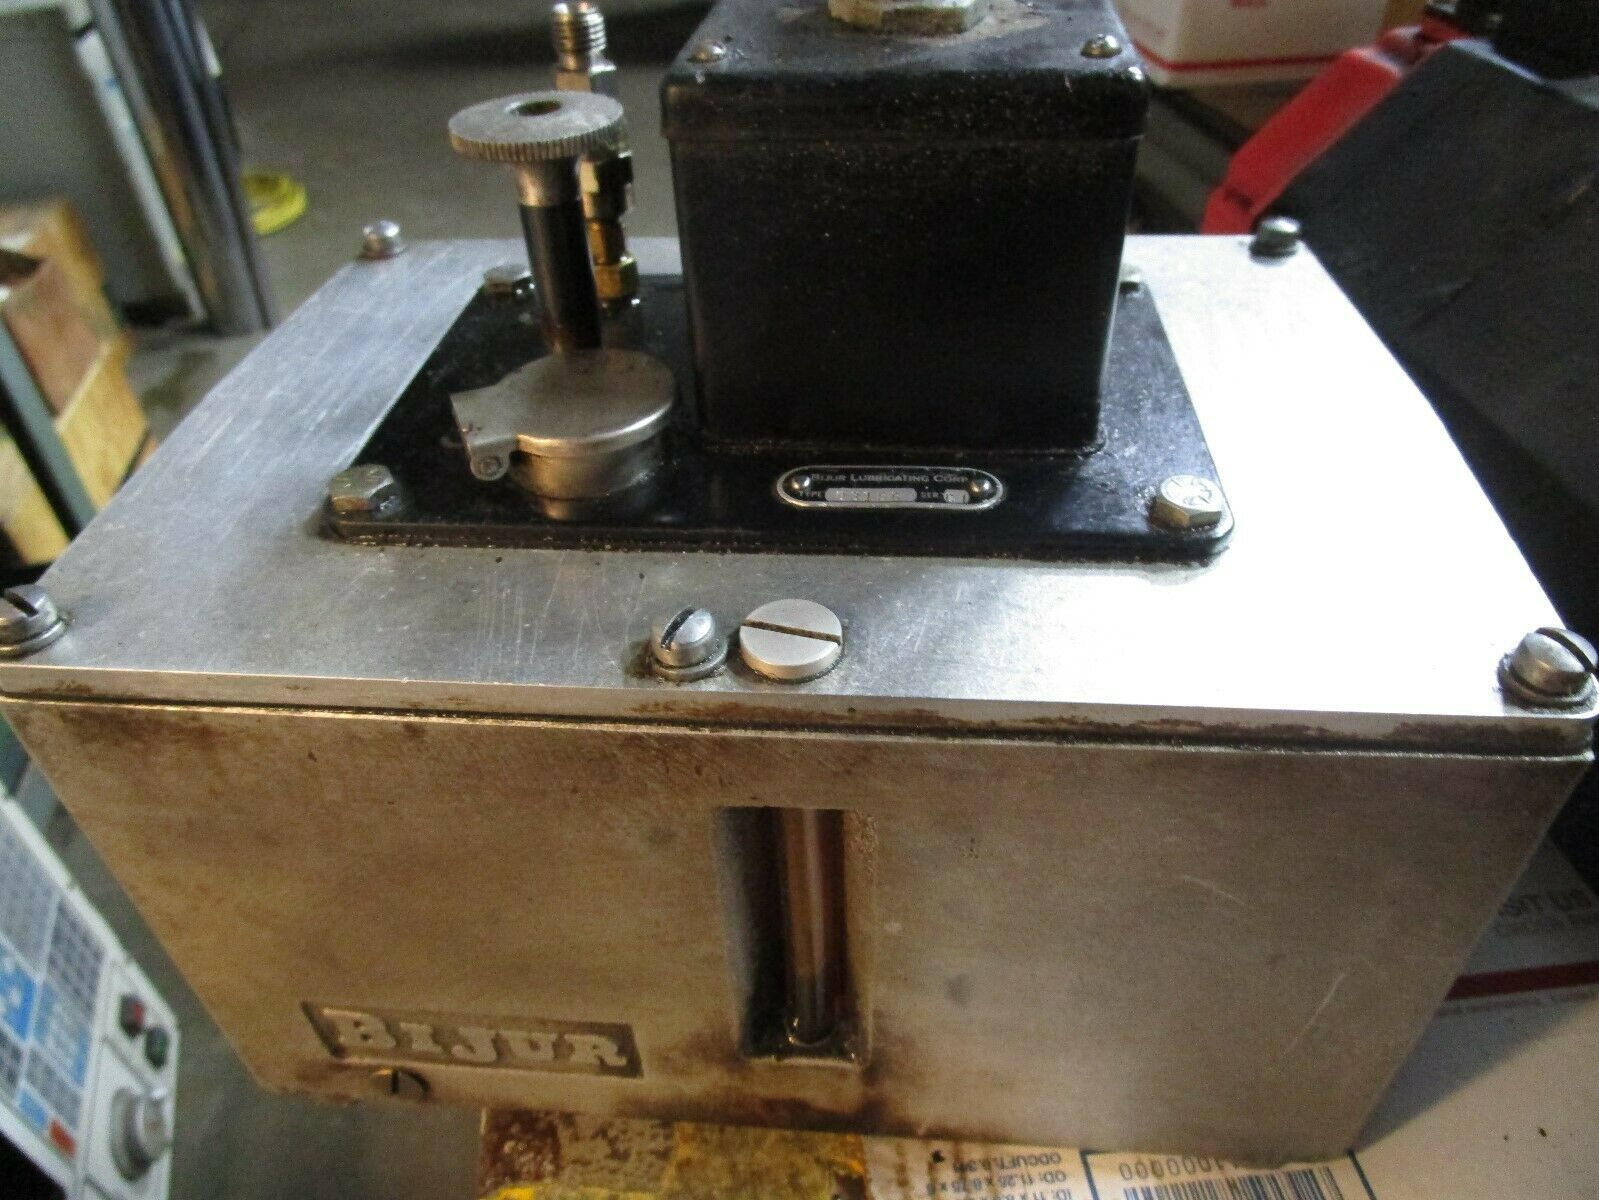 Bijur Electric Lube Pump Model D3156 Lube Unit with 1 Gallon Capacity 110V